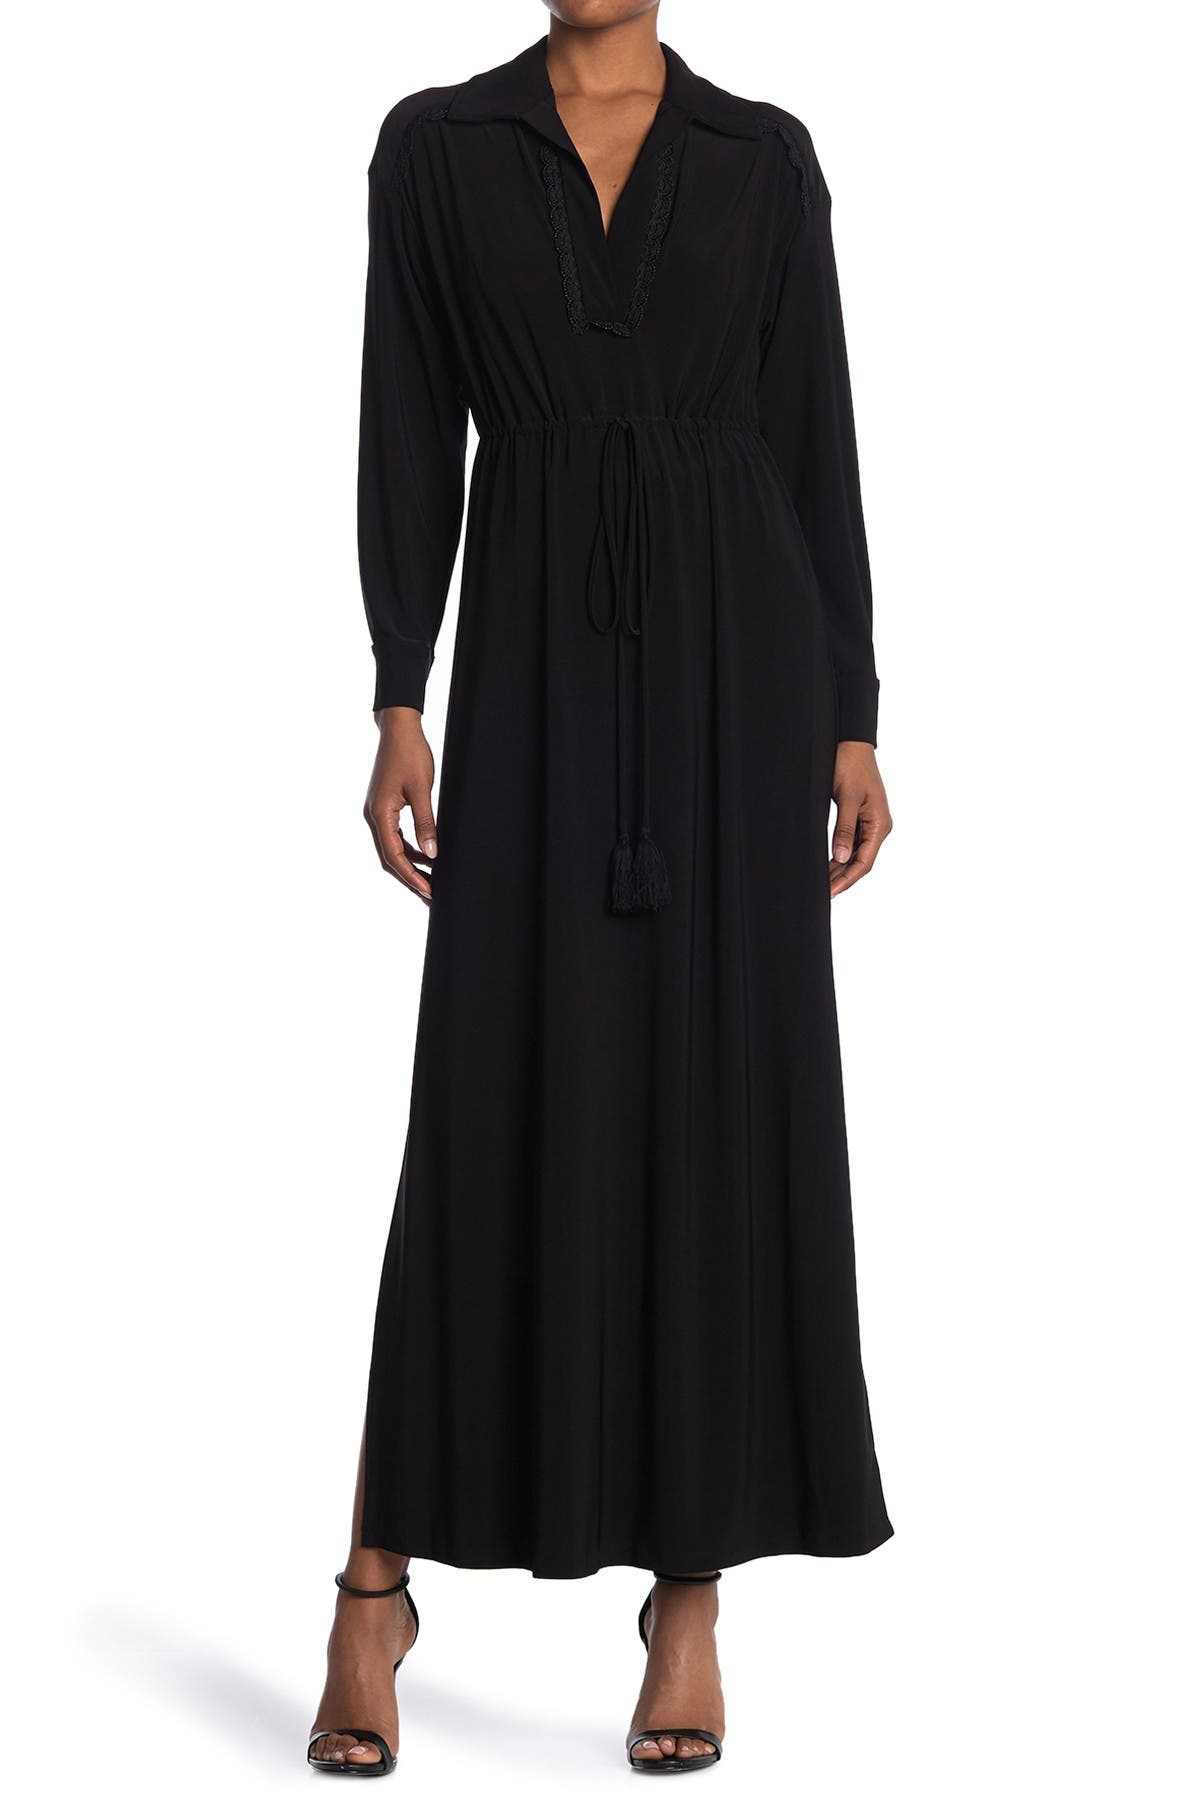 Image of Taylor Solid Jersey Maxi Shirt Dress